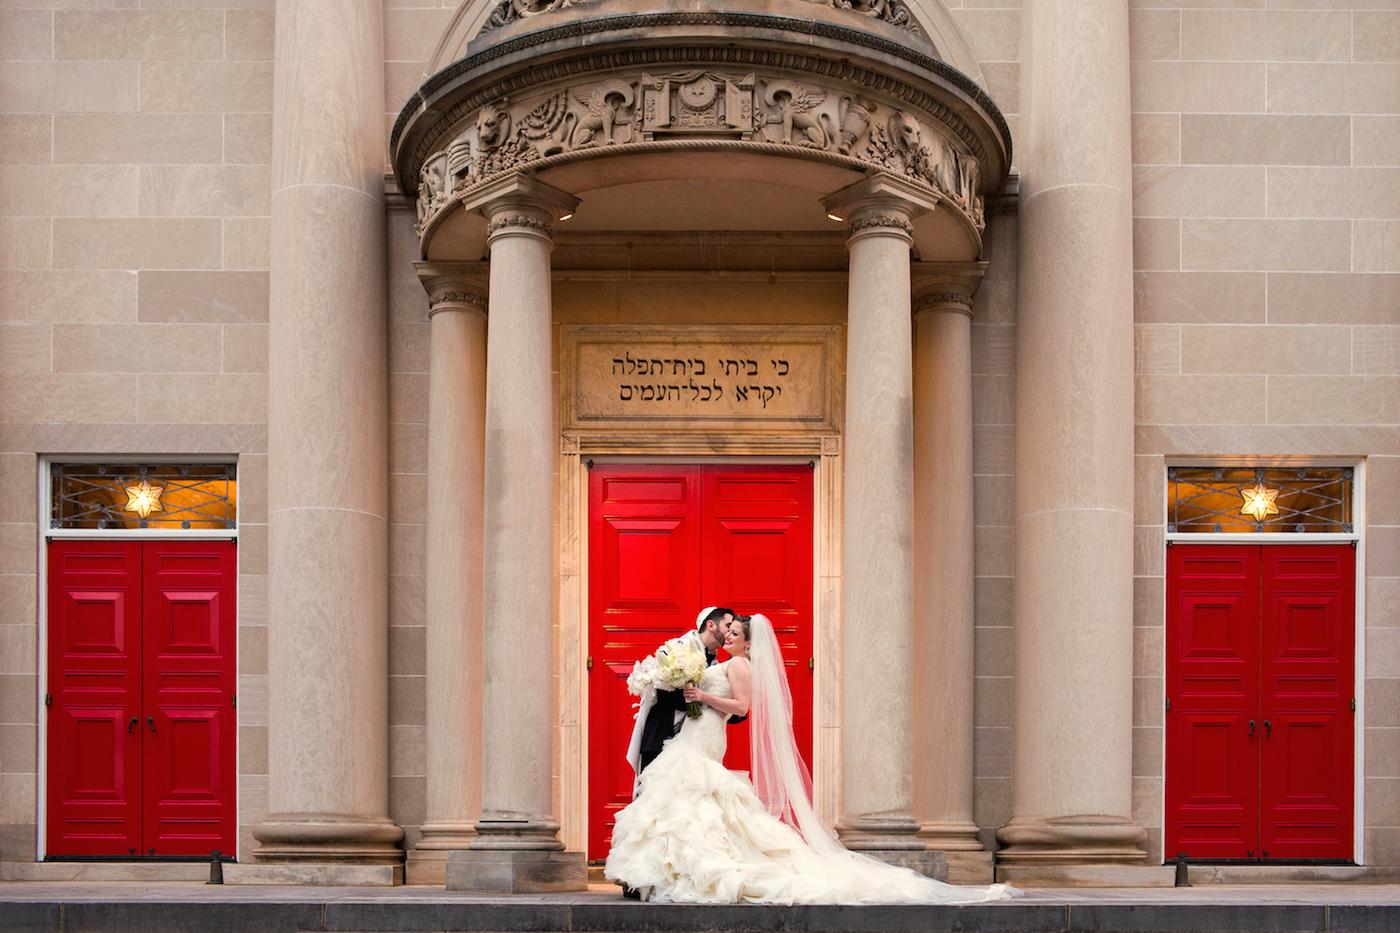 Glamorous Atlanta Jewish Wedding at The Temple | The Big Fat Jewish ...